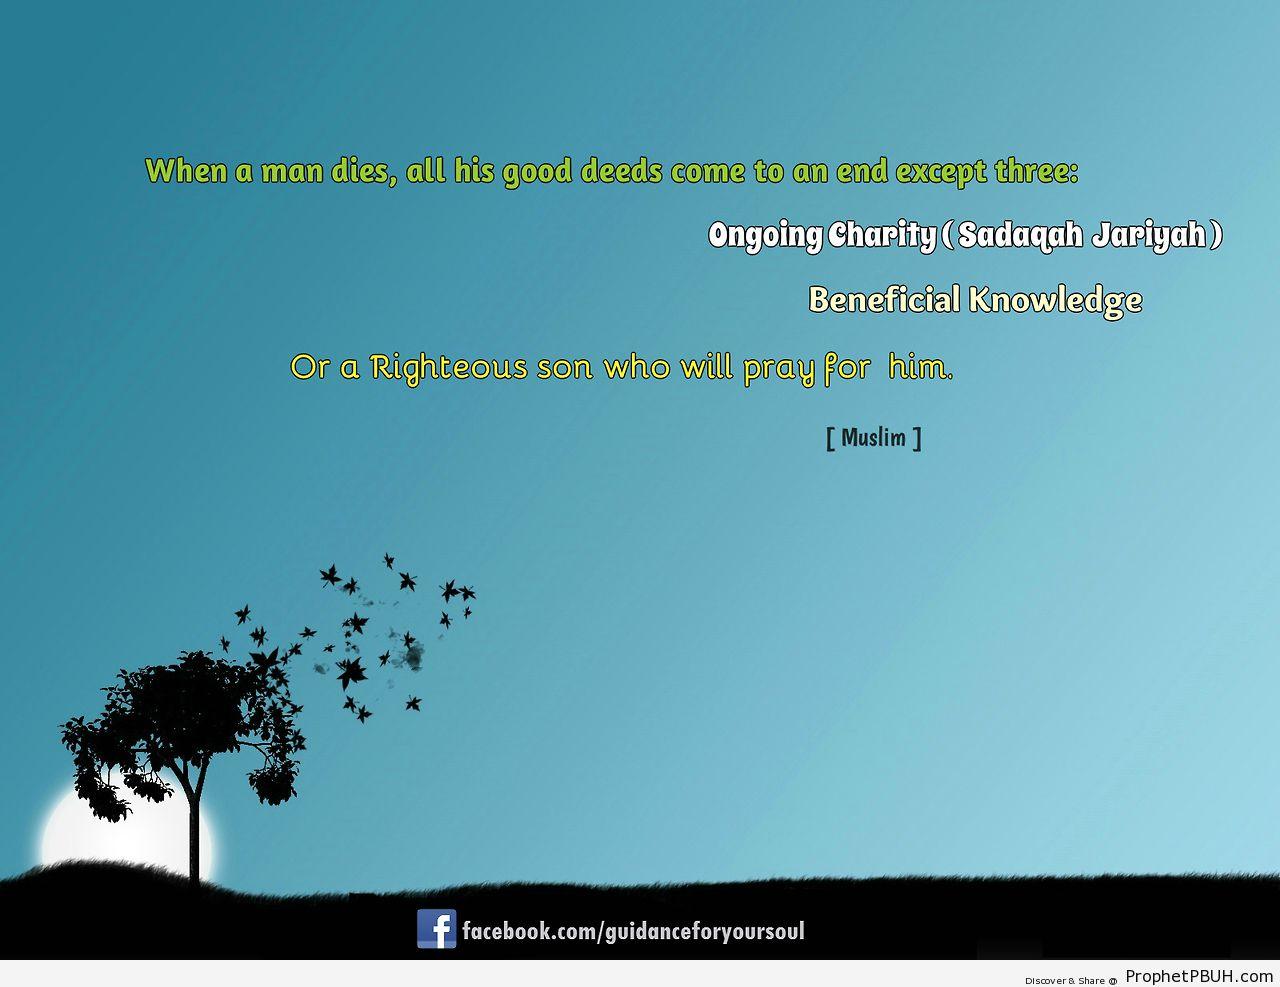 guidanceforyoursoul-  When aman dies,all his... - Islamic Quotes, Hadiths, Duas